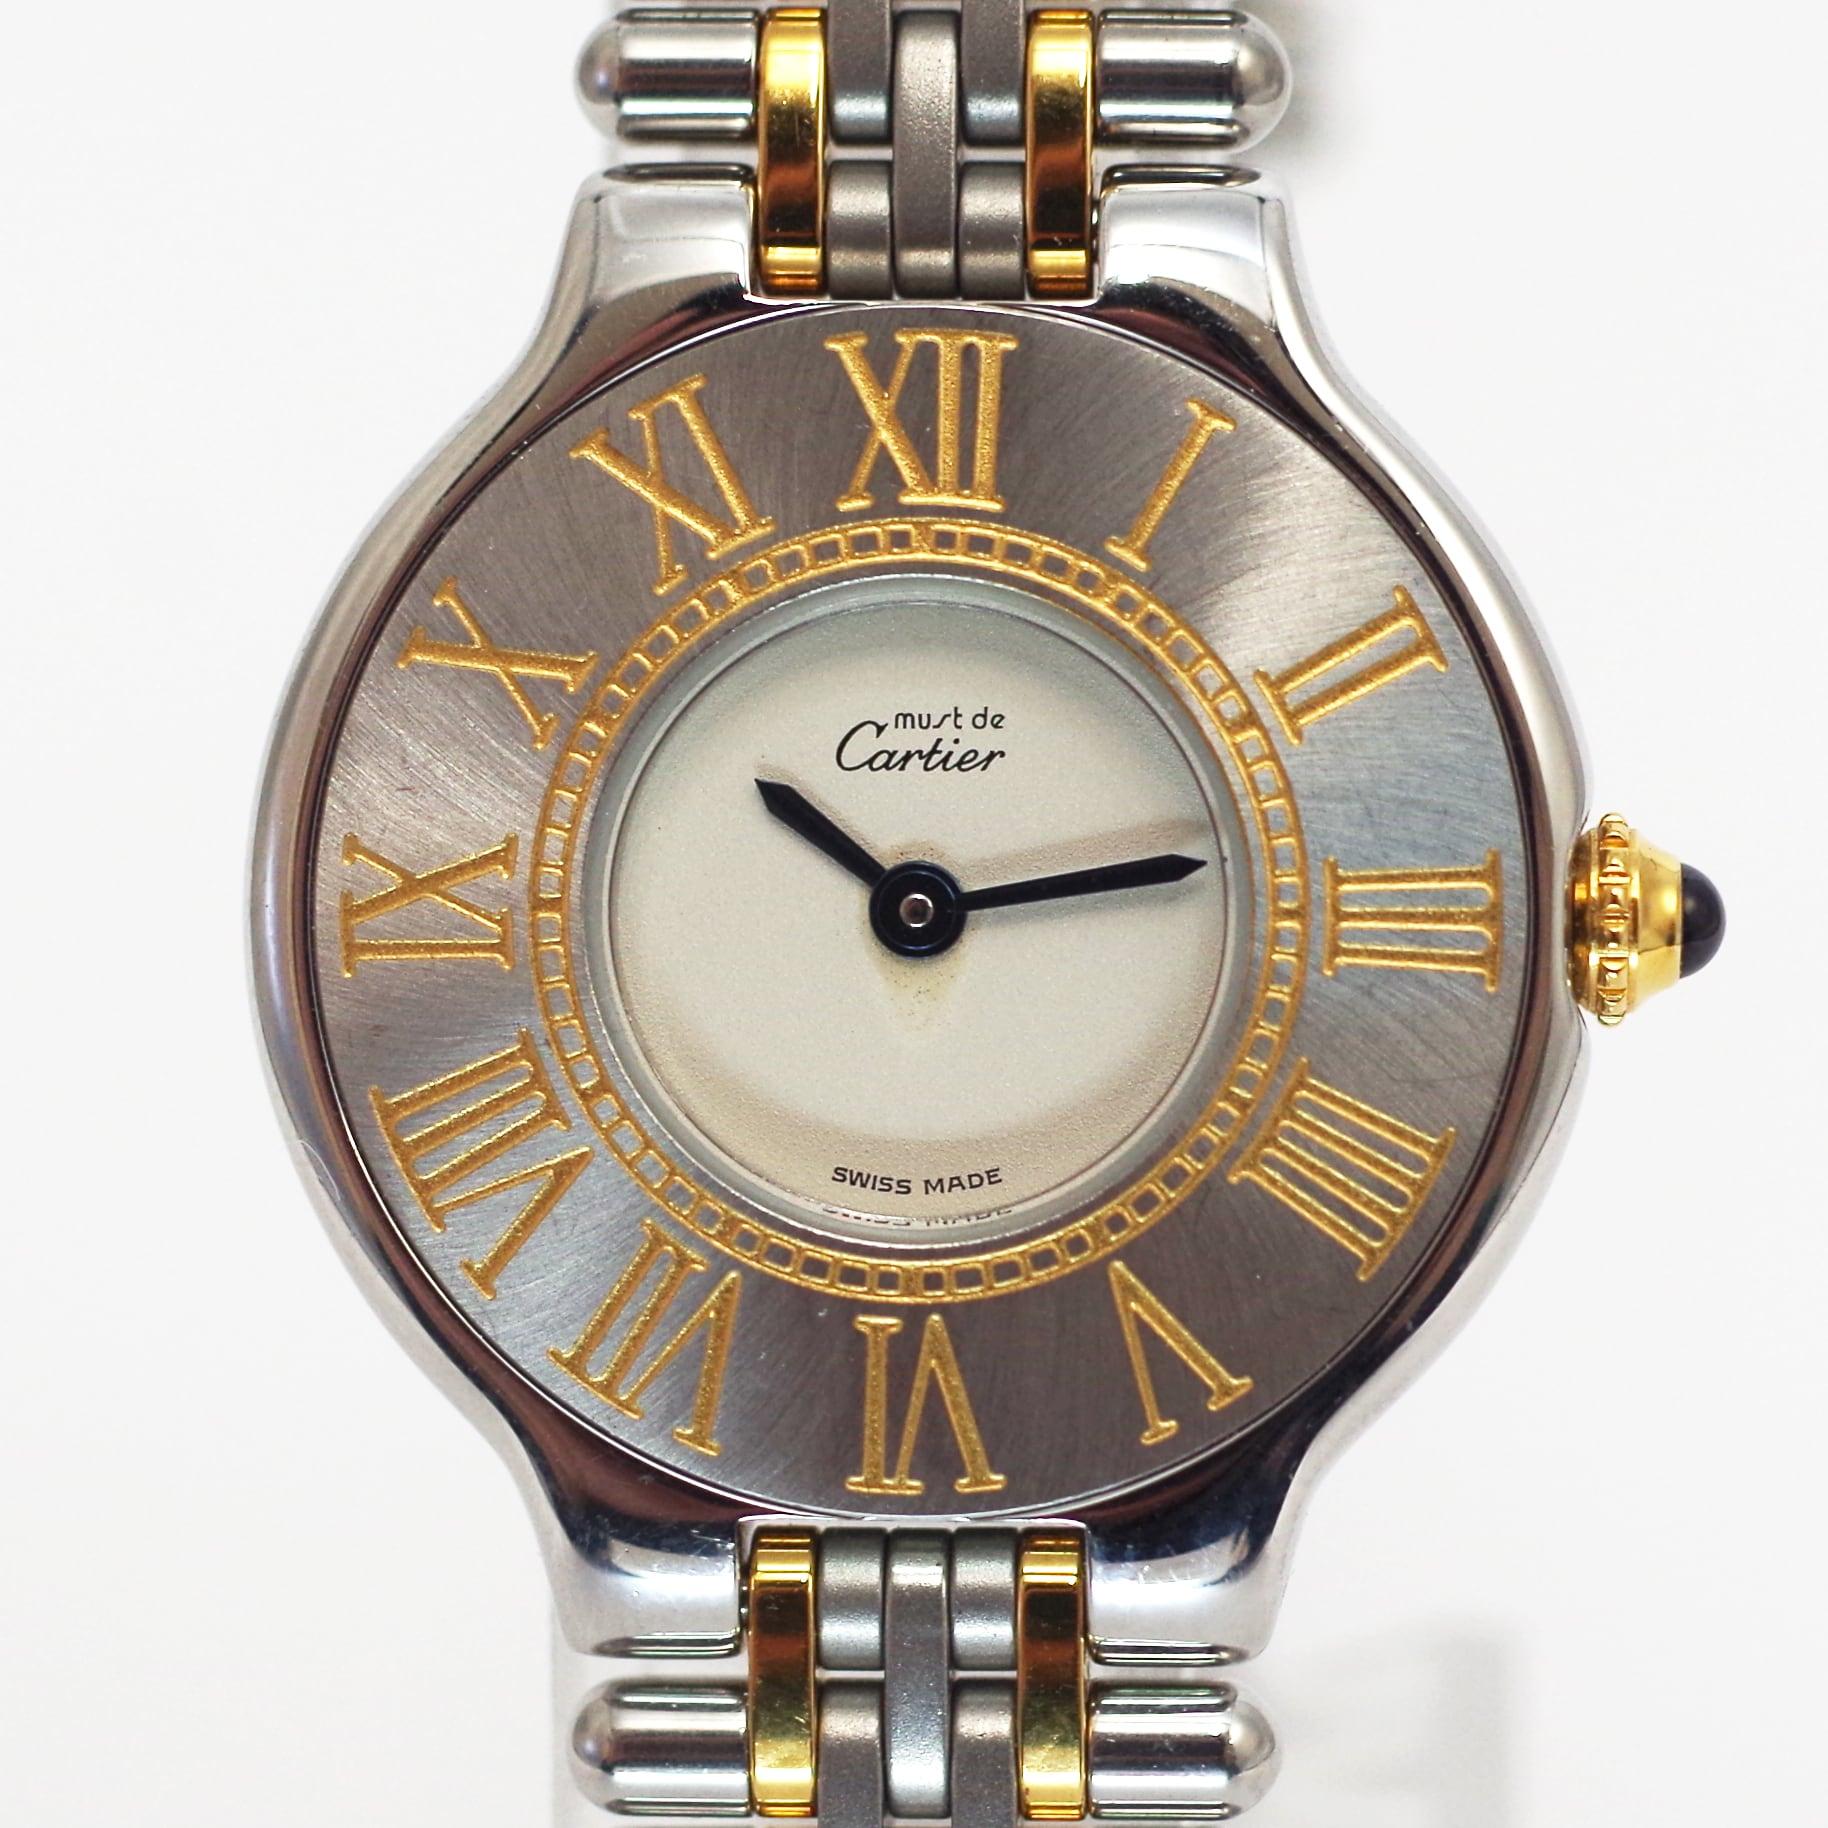 Cartier  カルティエ ヴァンティアン クオーツ ホワイト レディース 腕時計